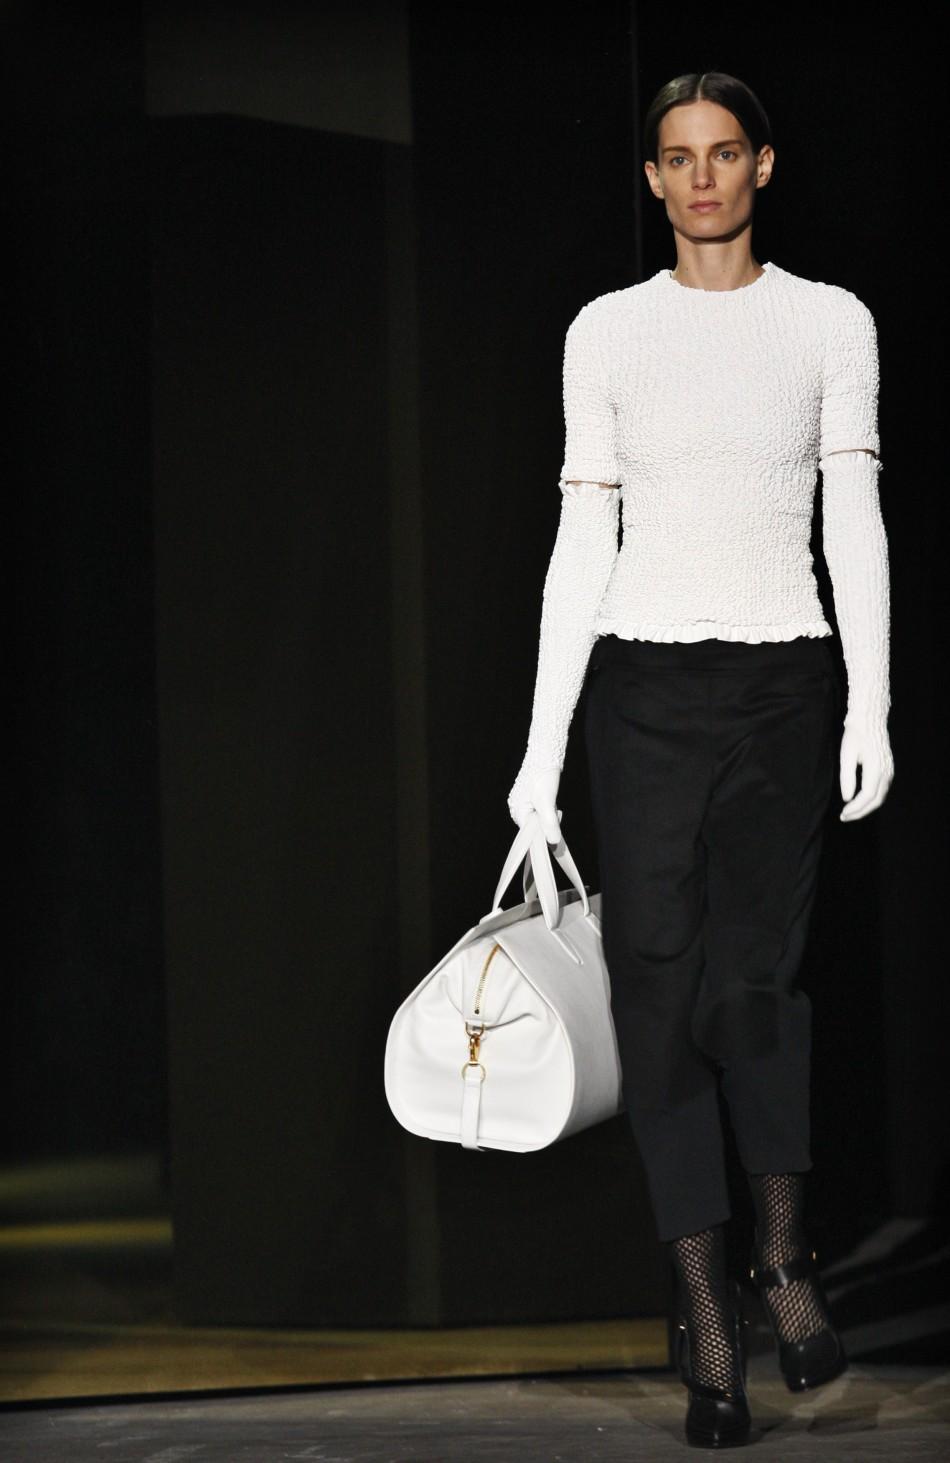 New York Fashion Week 2012- Alexander Wang